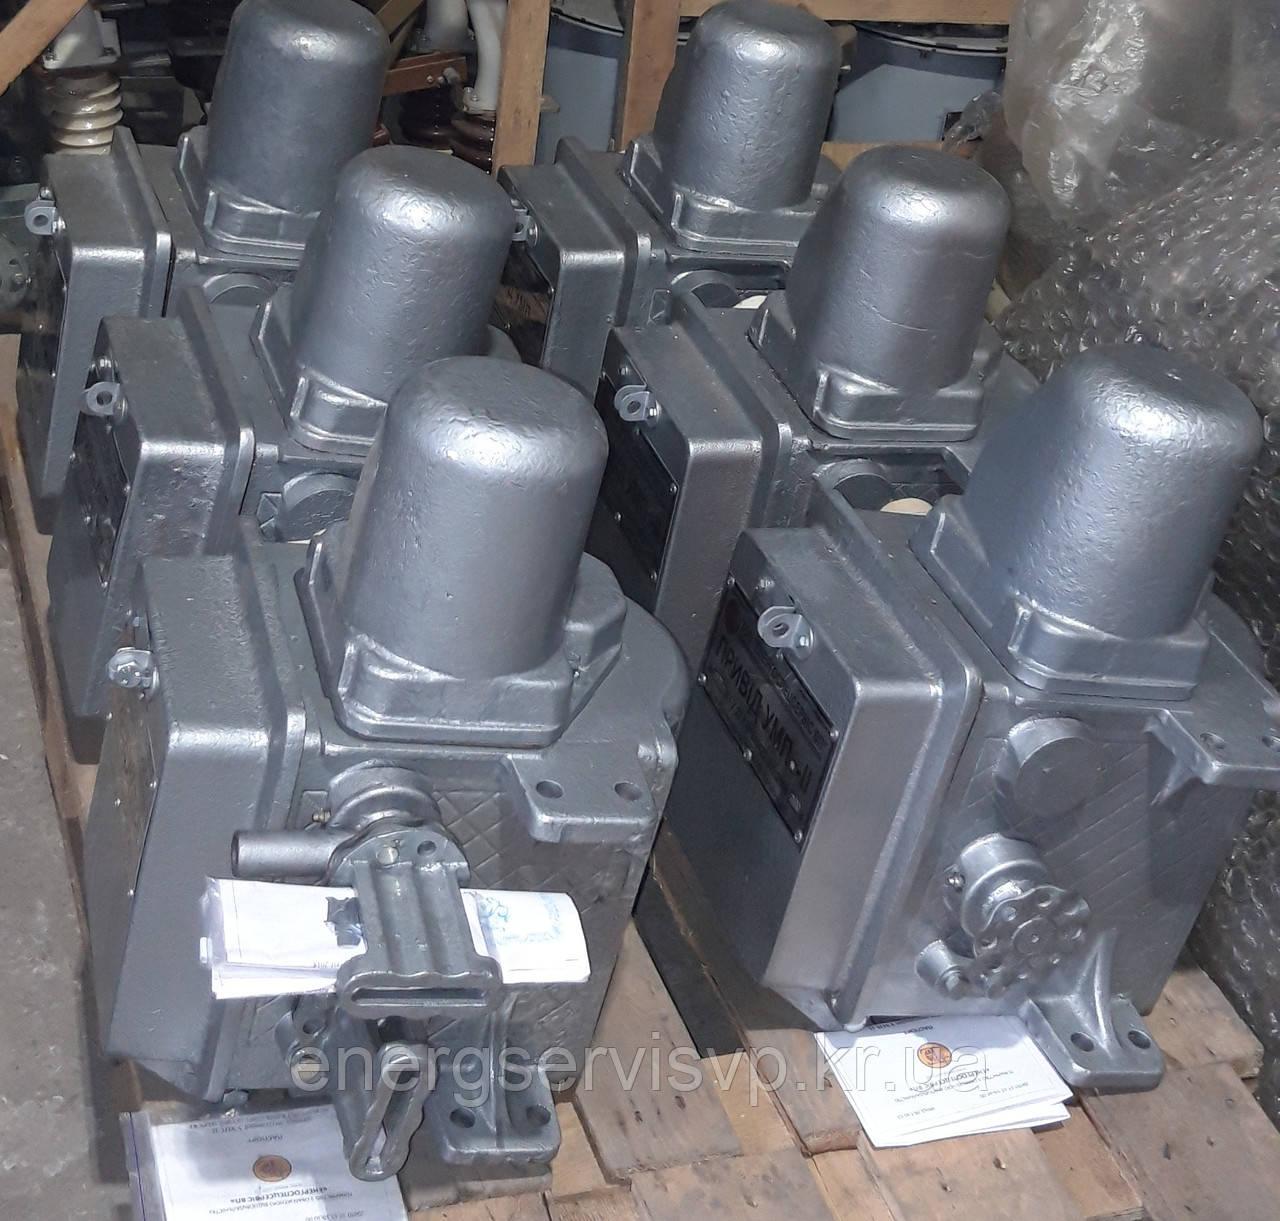 Привод моторный УМП-ІІ